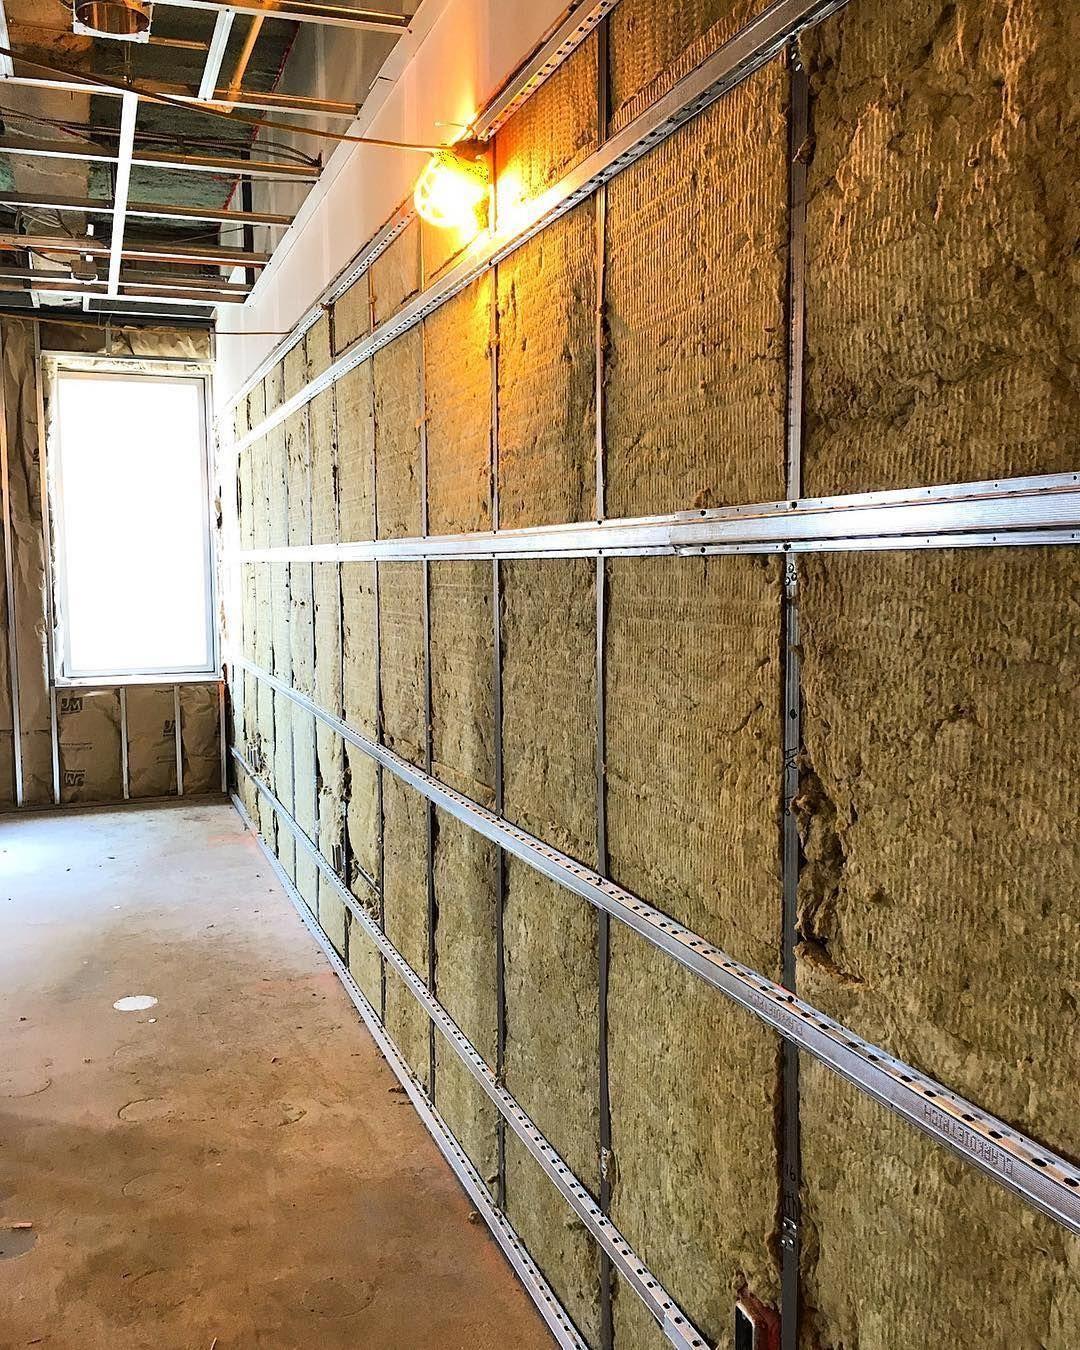 Roxulincnice One By Blk Roc Do It Right Make It Tight Roxulinc Insulated Demising Walls Ready For Rock Metalfram Union Carpenter Insulation Windbreaks